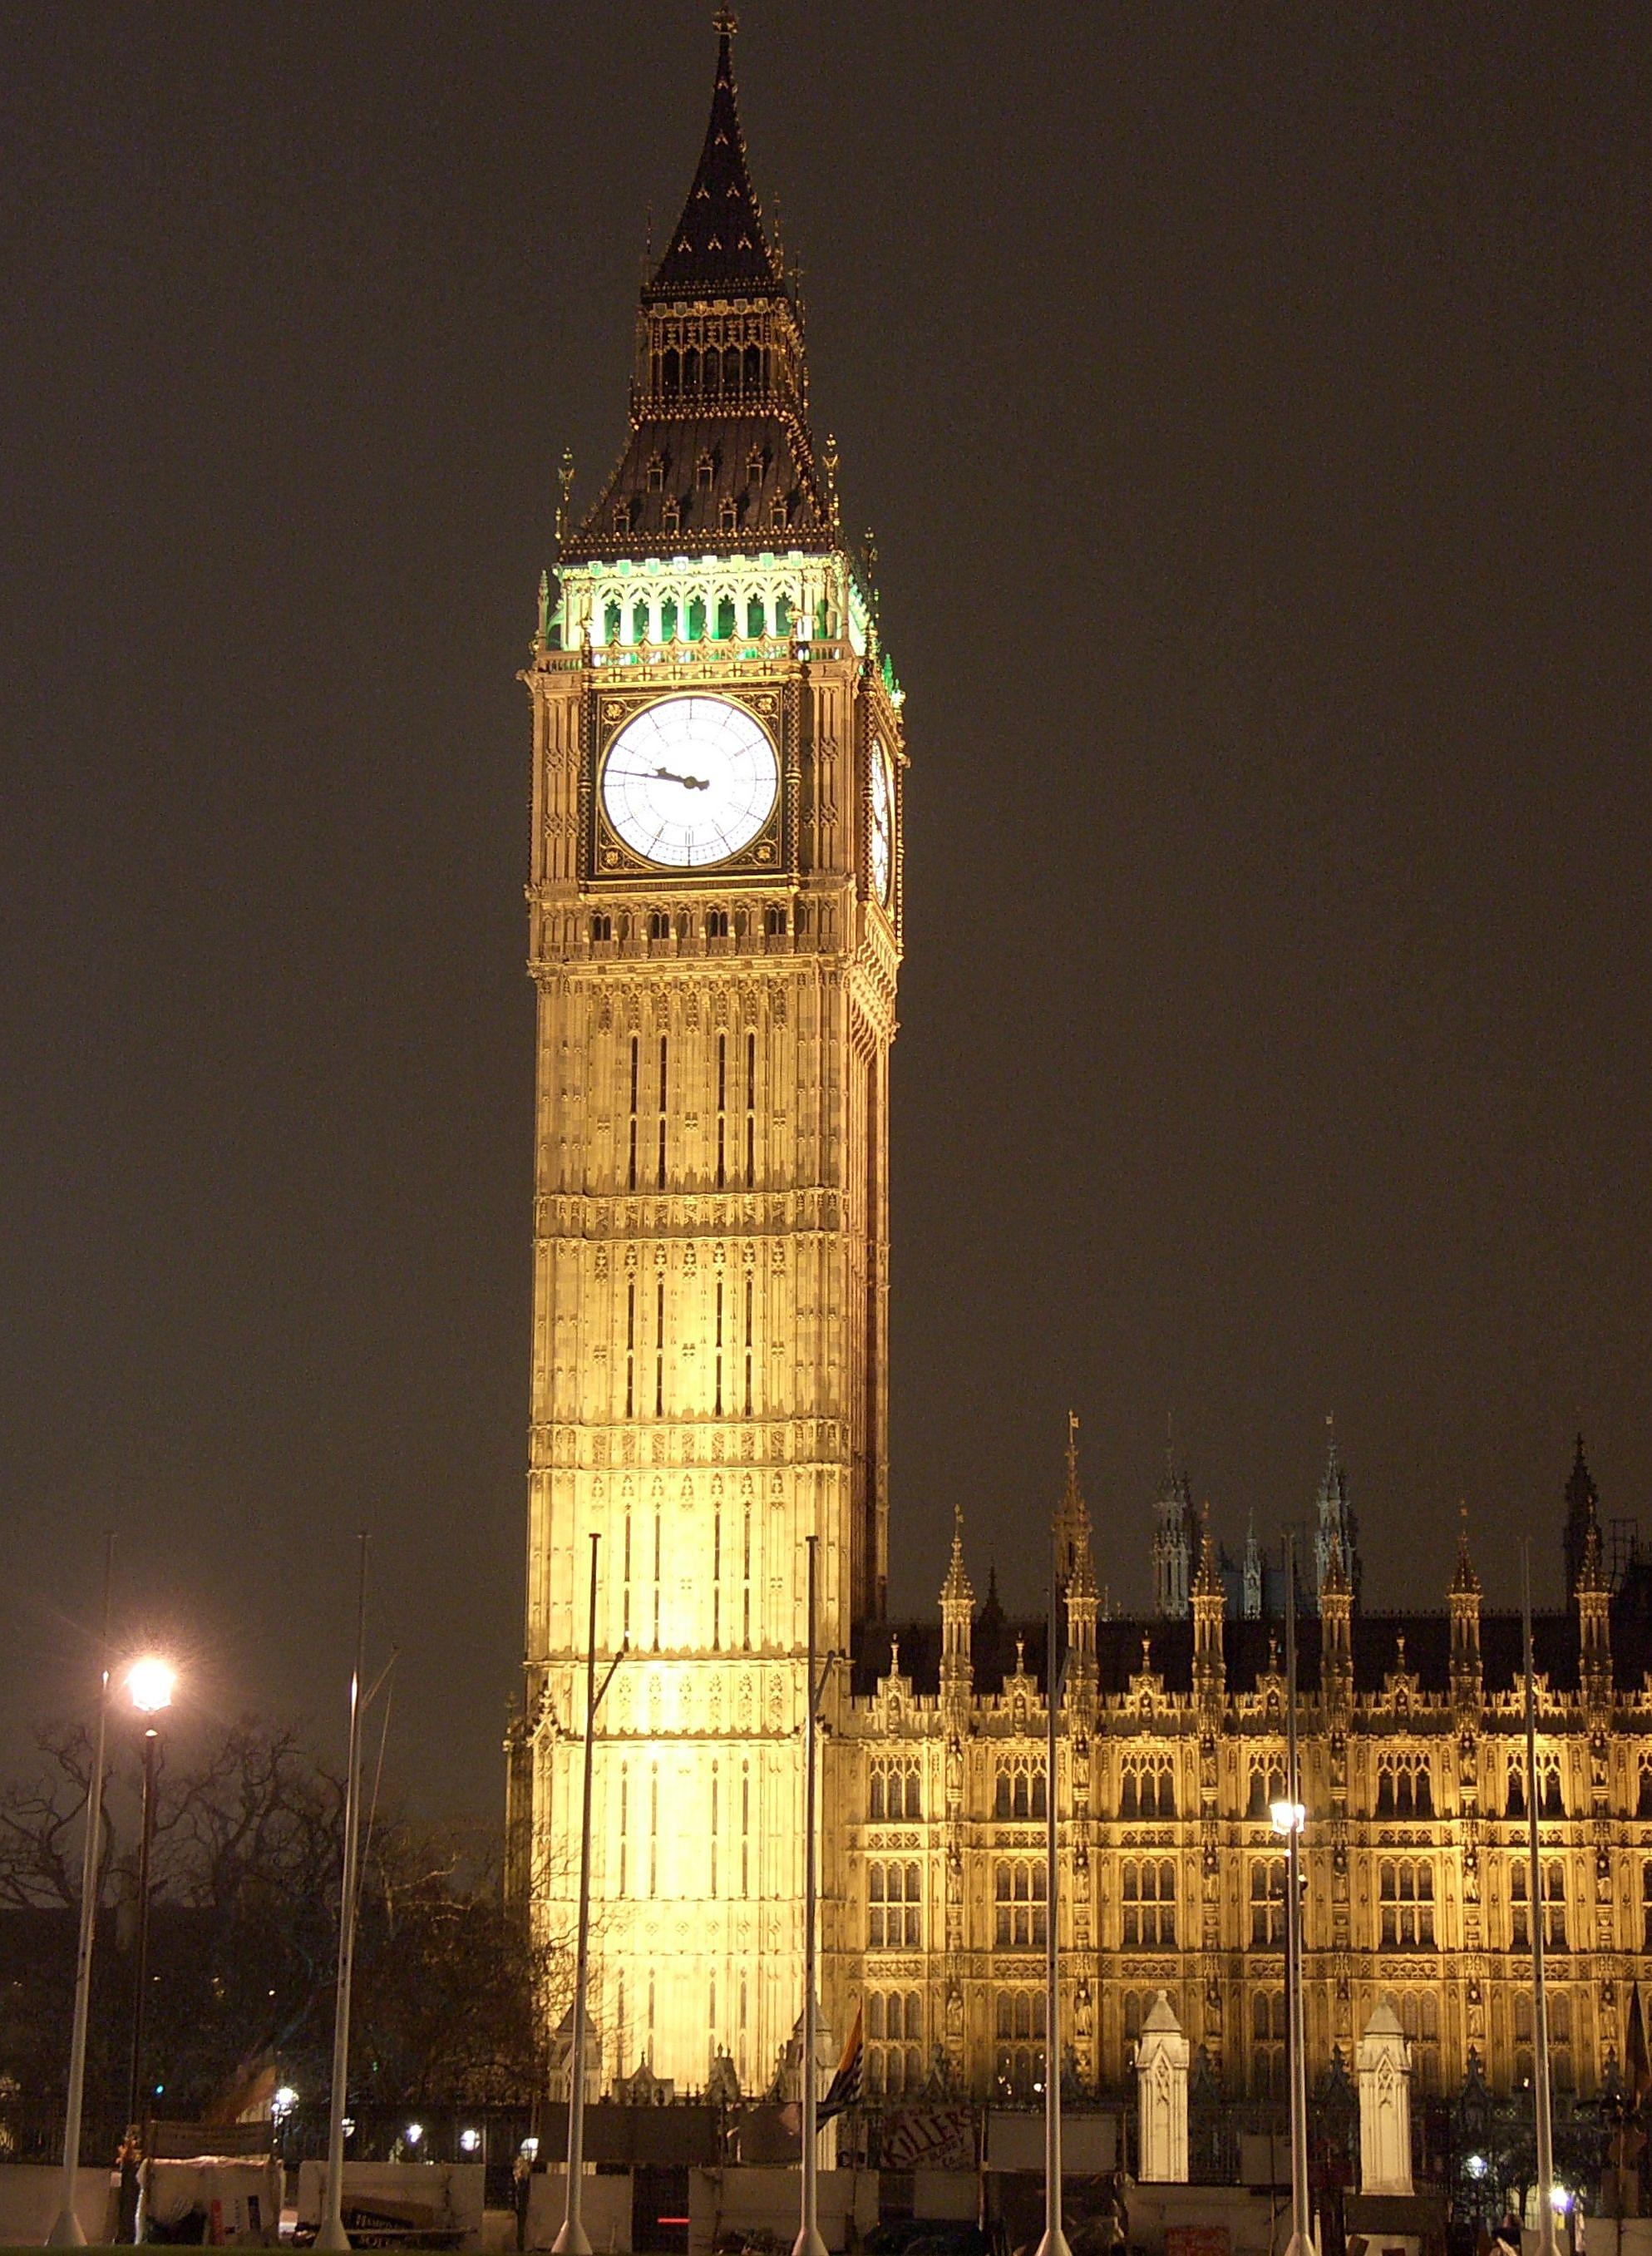 Londres_-_Big_Ben